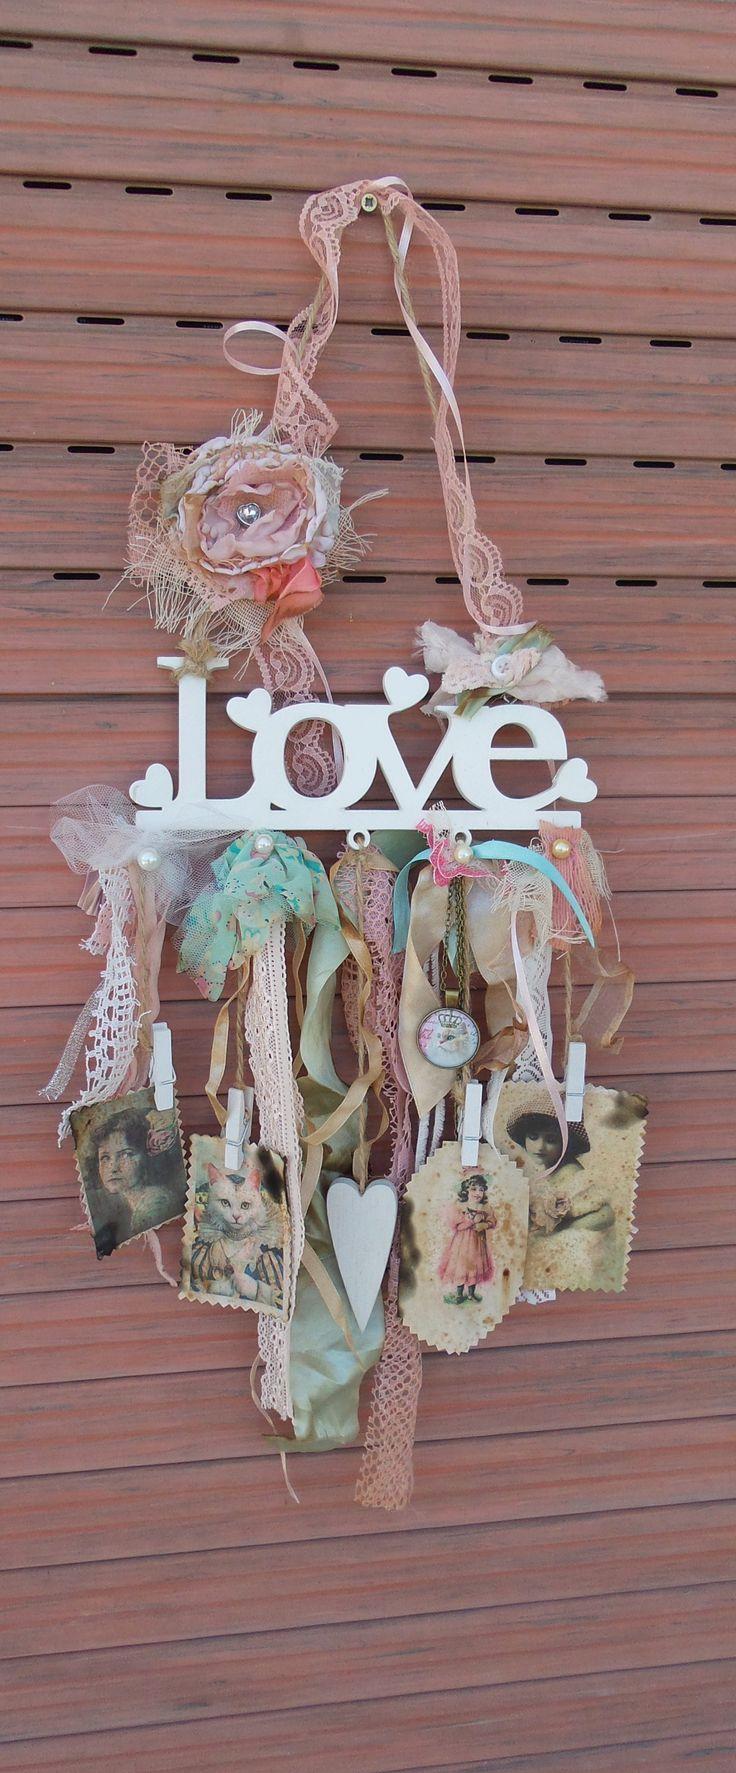 Shabby Decor, LOVE sign, Boho chic decor, Bohemian soul, LOVE Wood Letters, Shabby cat, Love, Wood Love Sign, French Vintage Inspired Cat